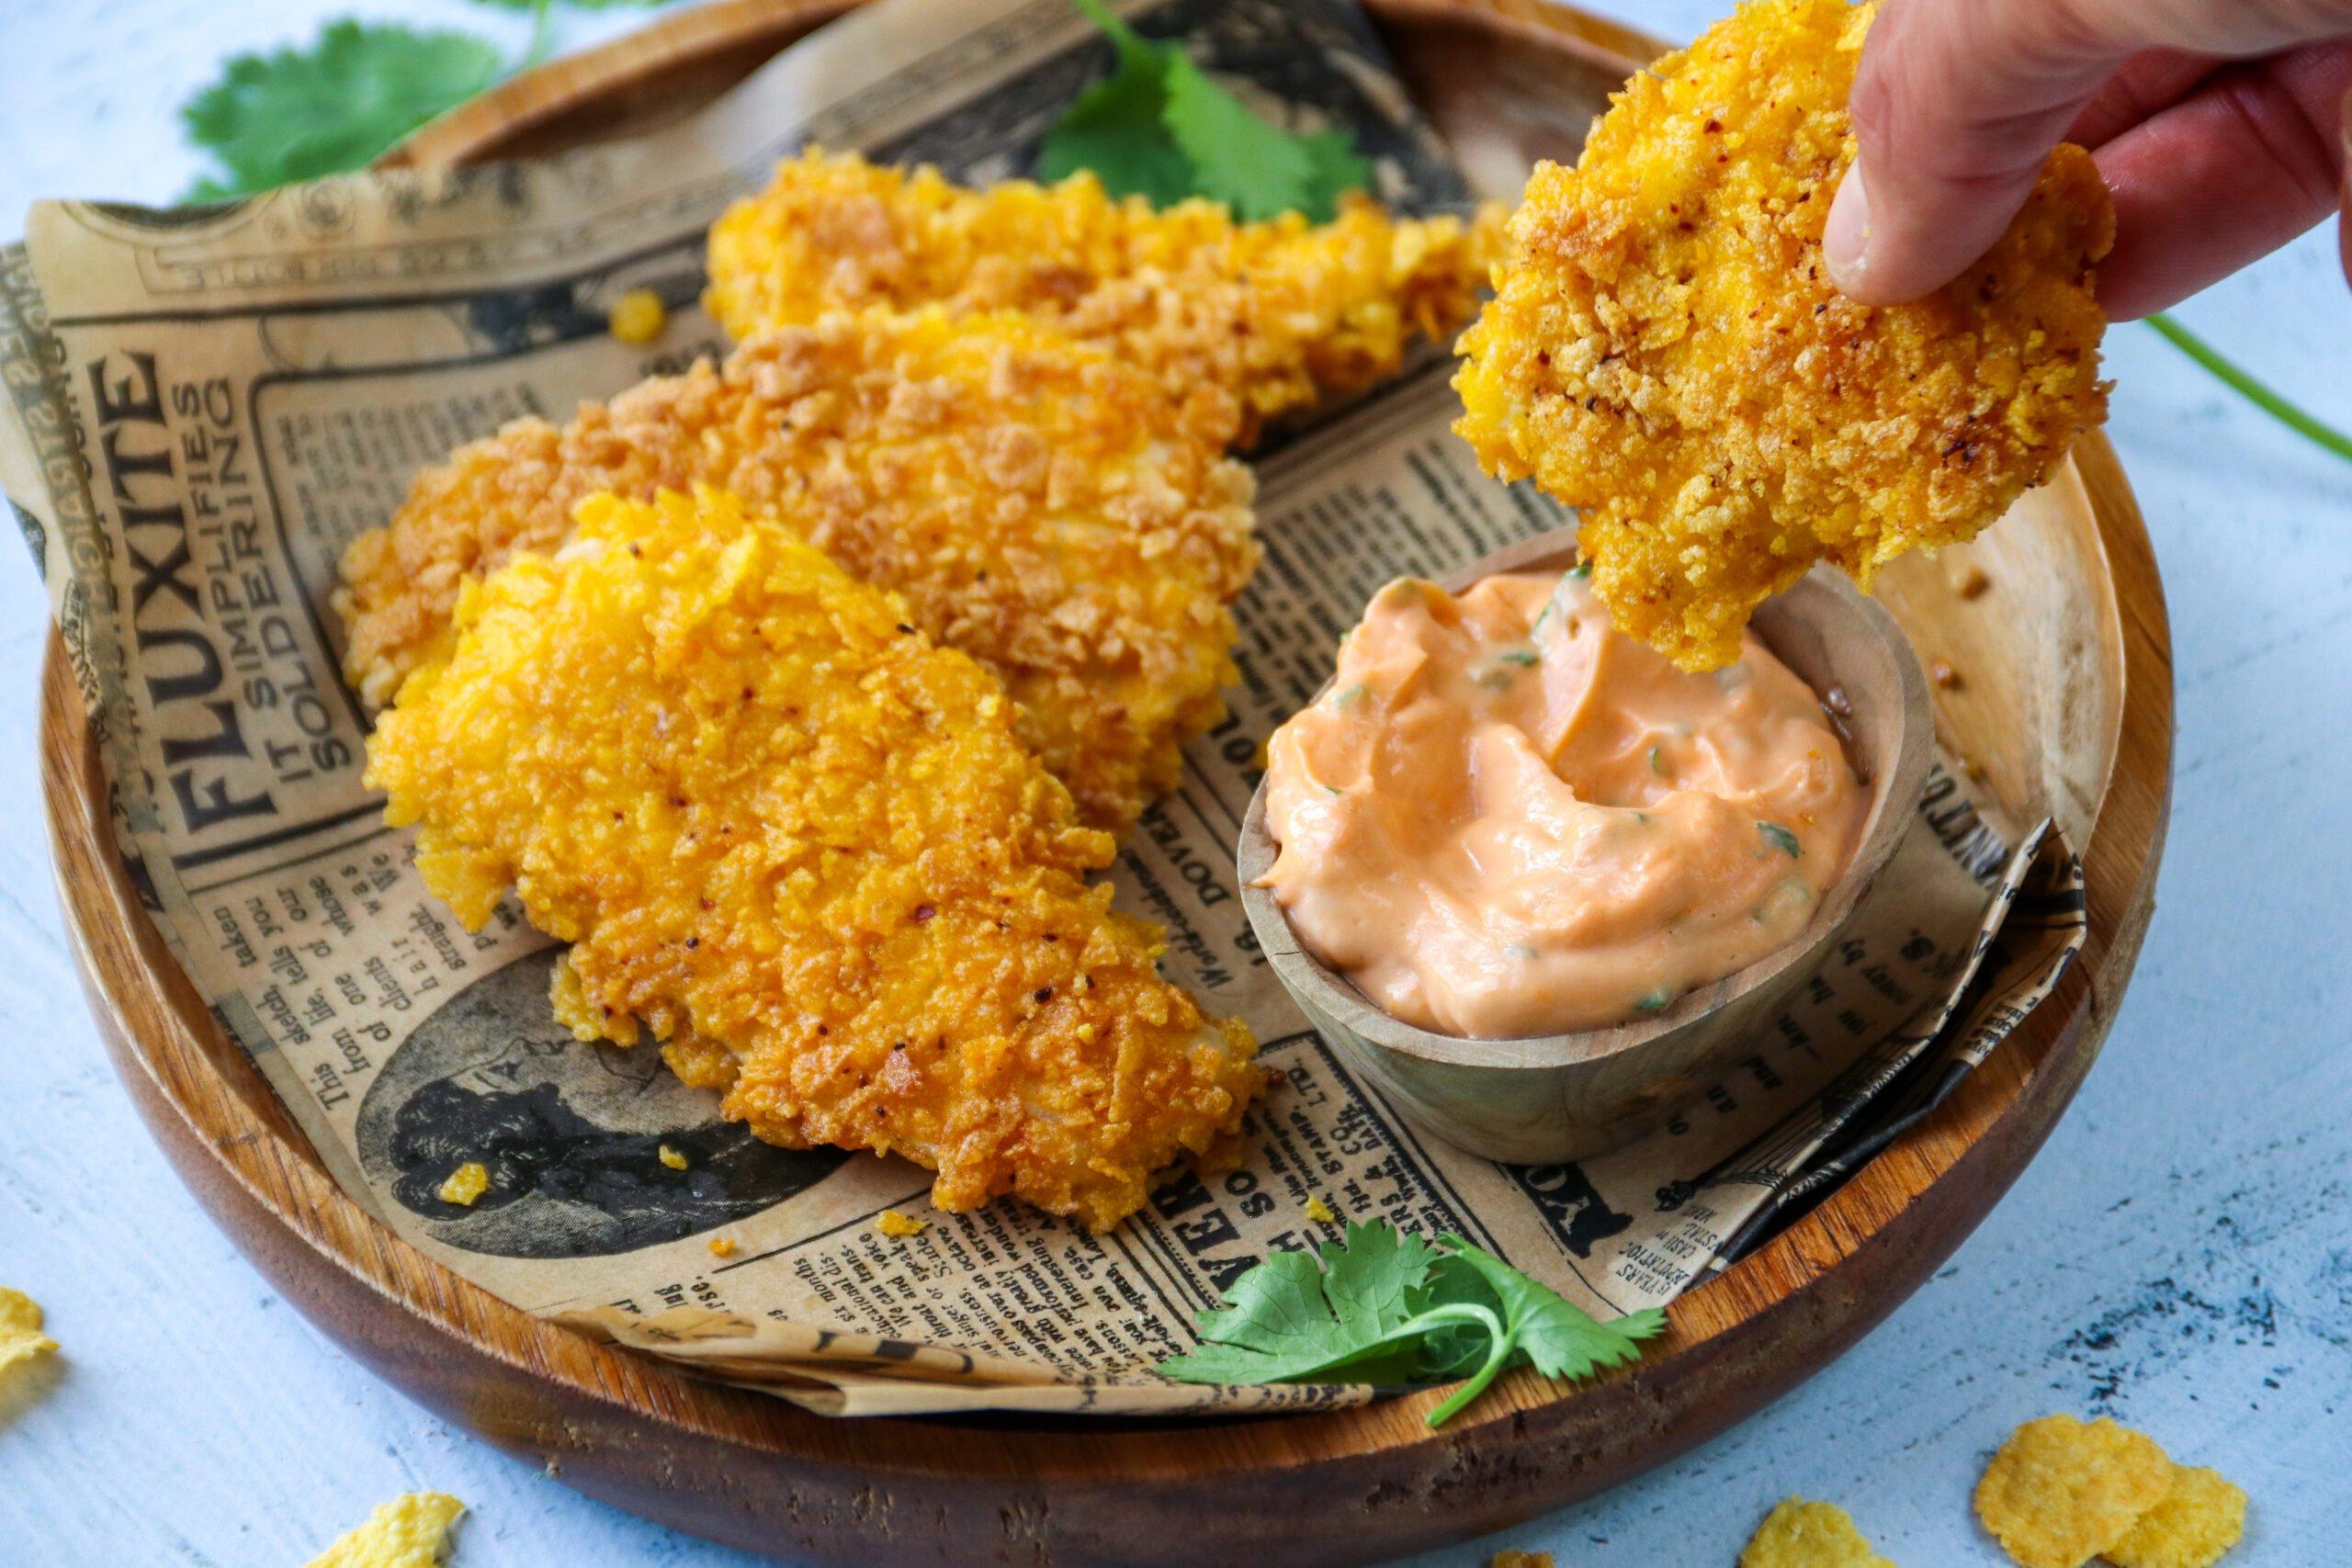 Crousti'nuggets sans friture